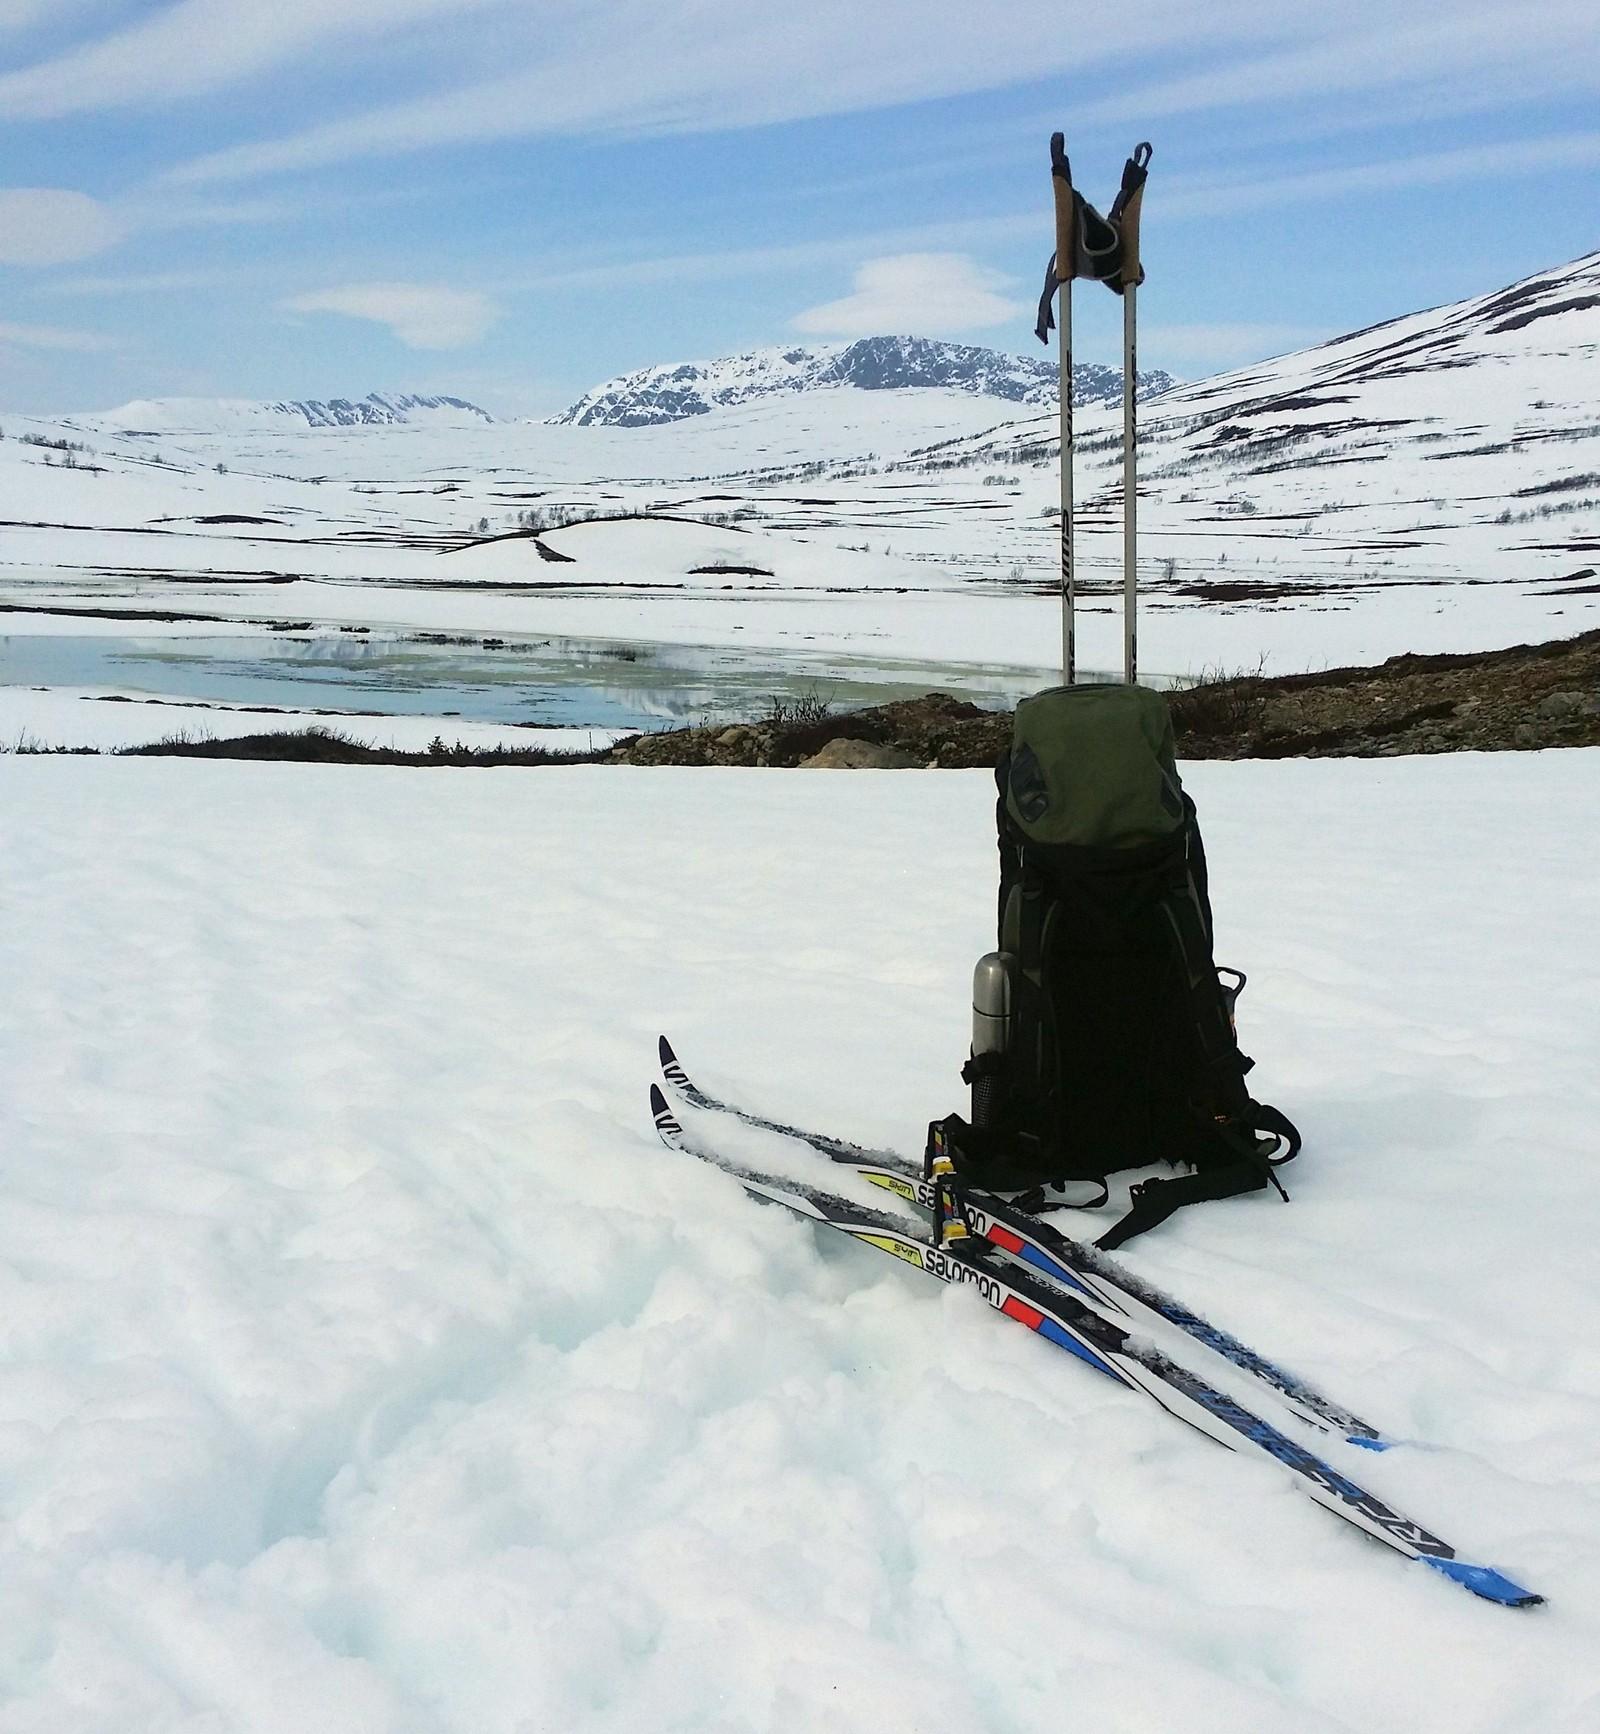 Med Blåhø i sikte på skitur i mai